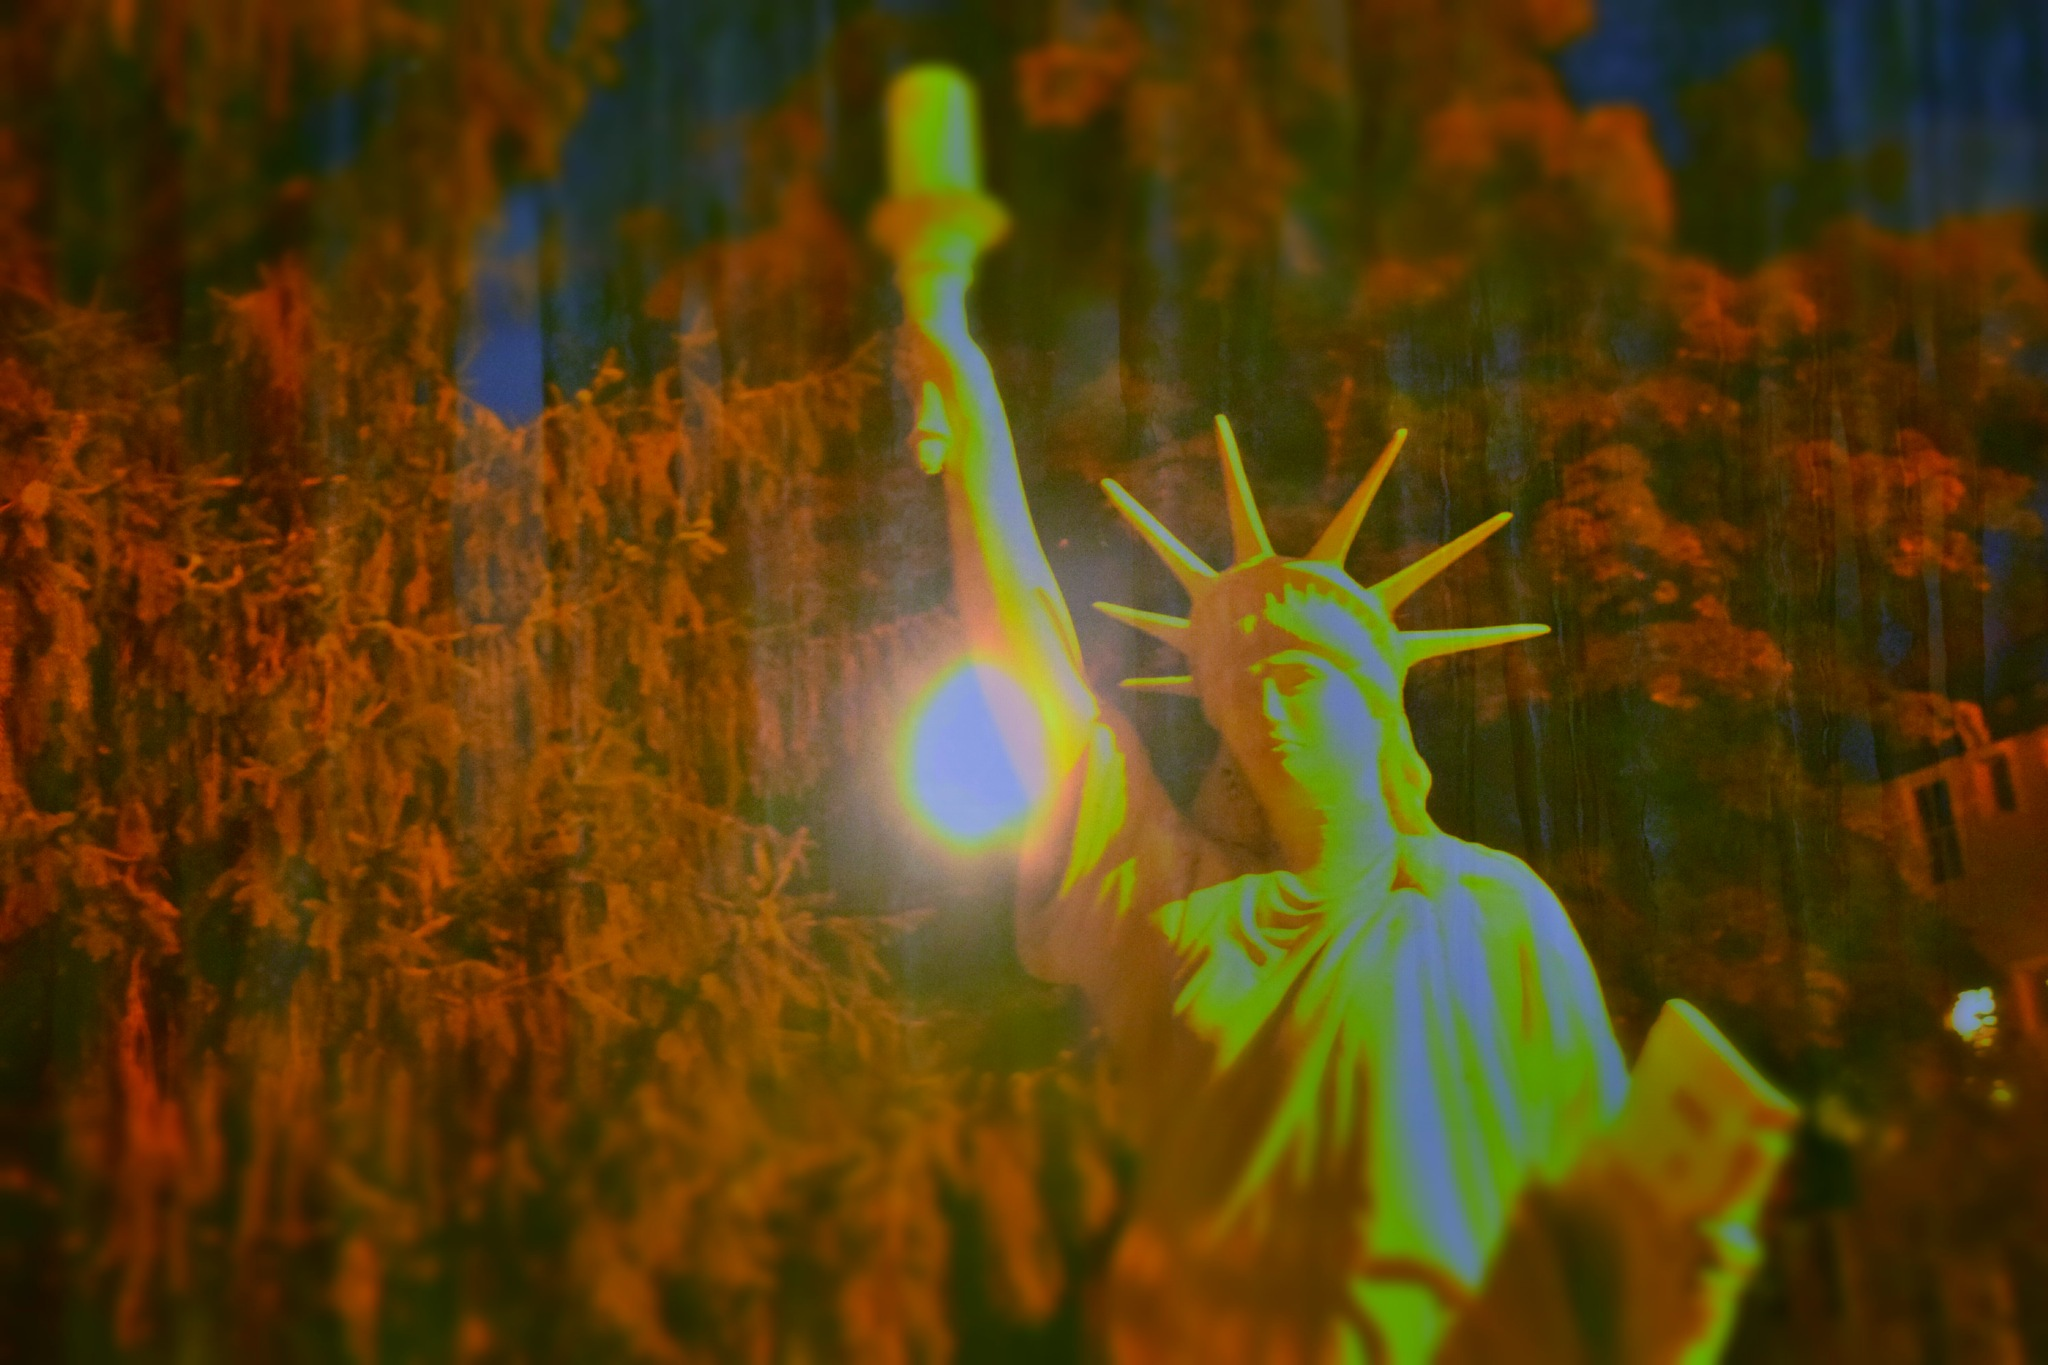 Night Falls On Liberty by RichardJTreitner